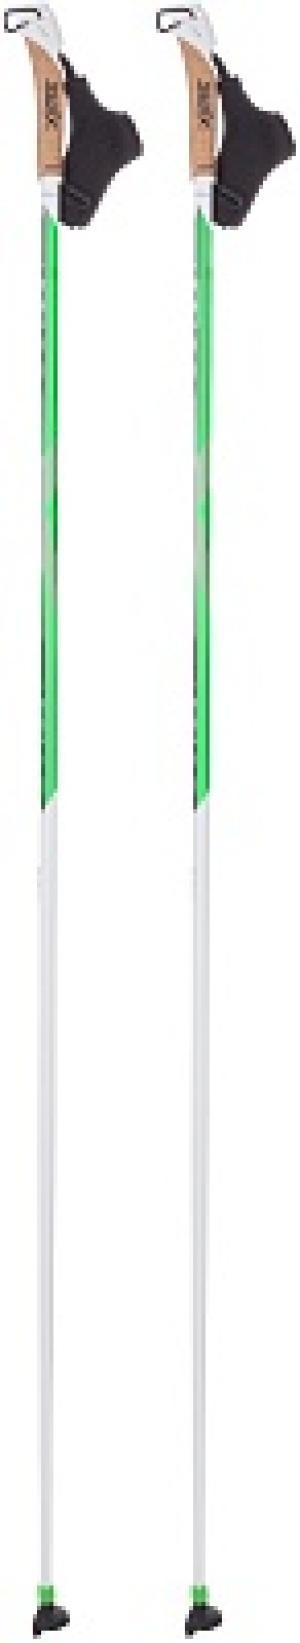 Палки для беговых лыж  Team TBS Swix